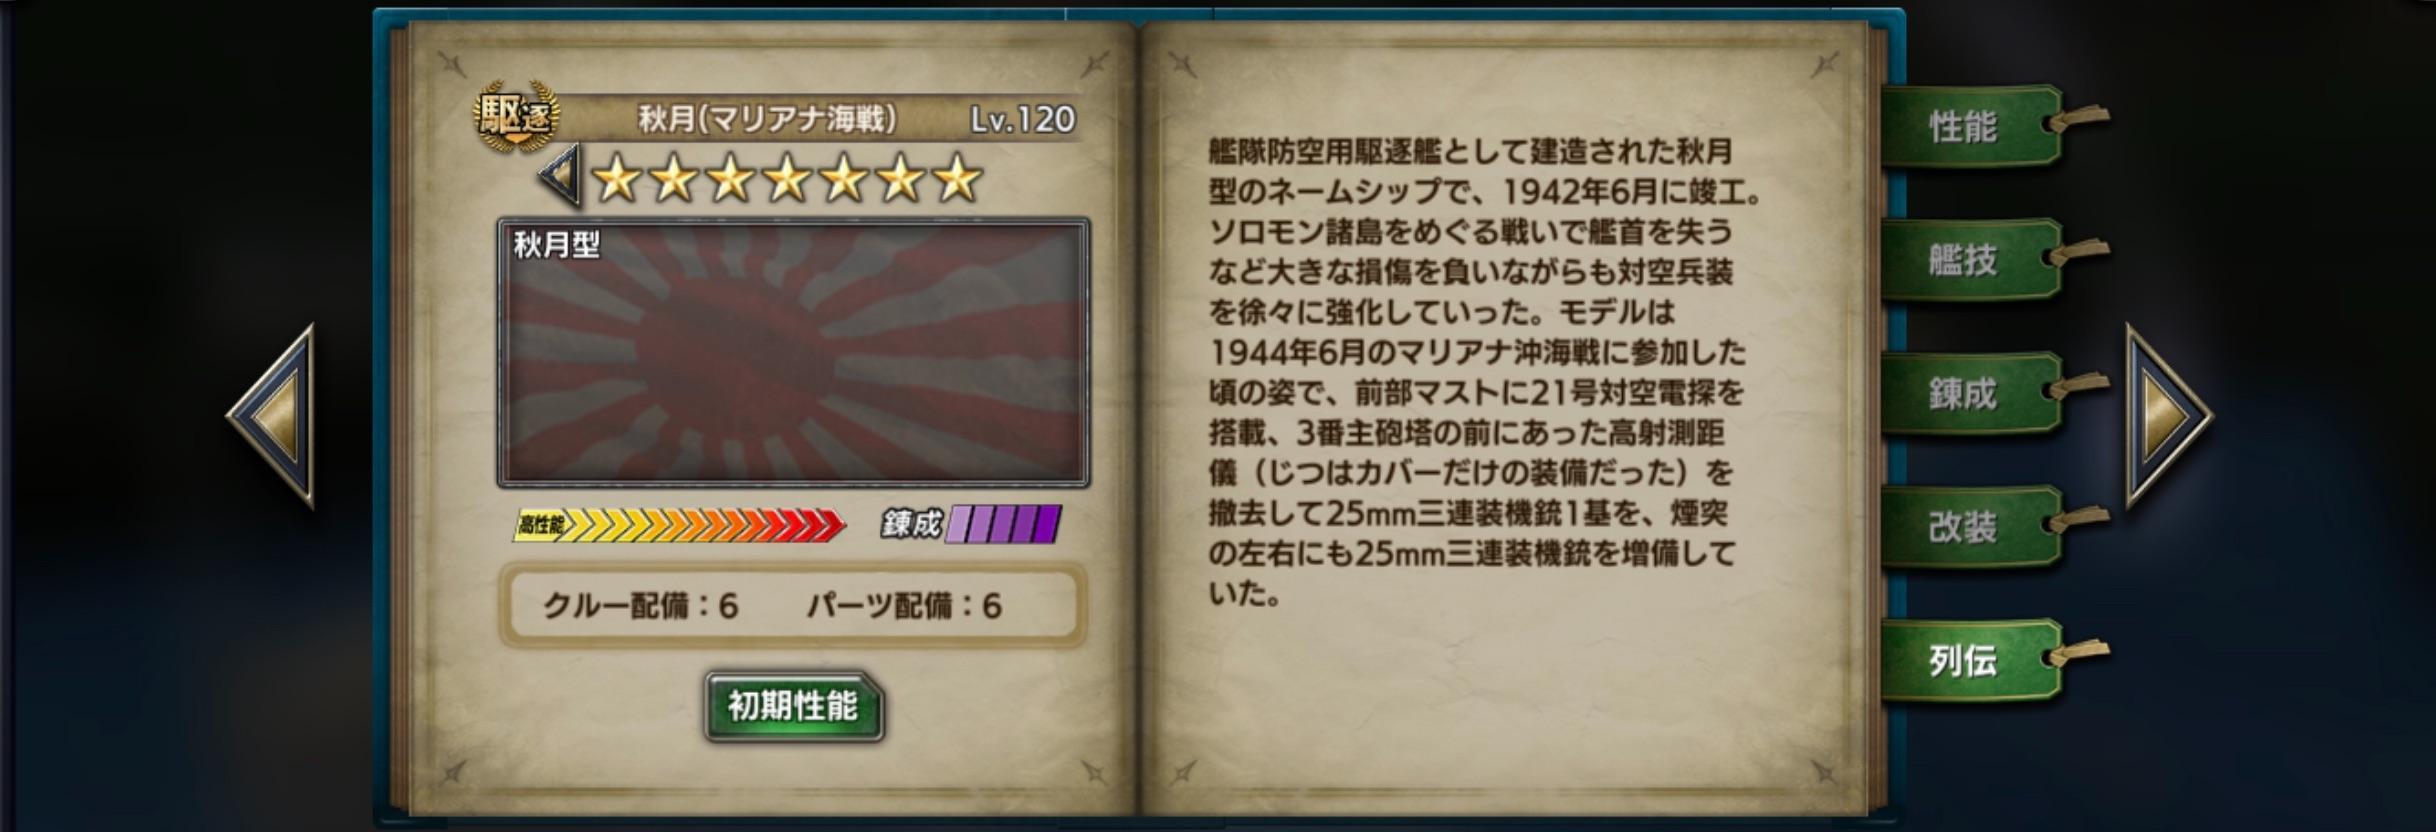 AkizukiM-history